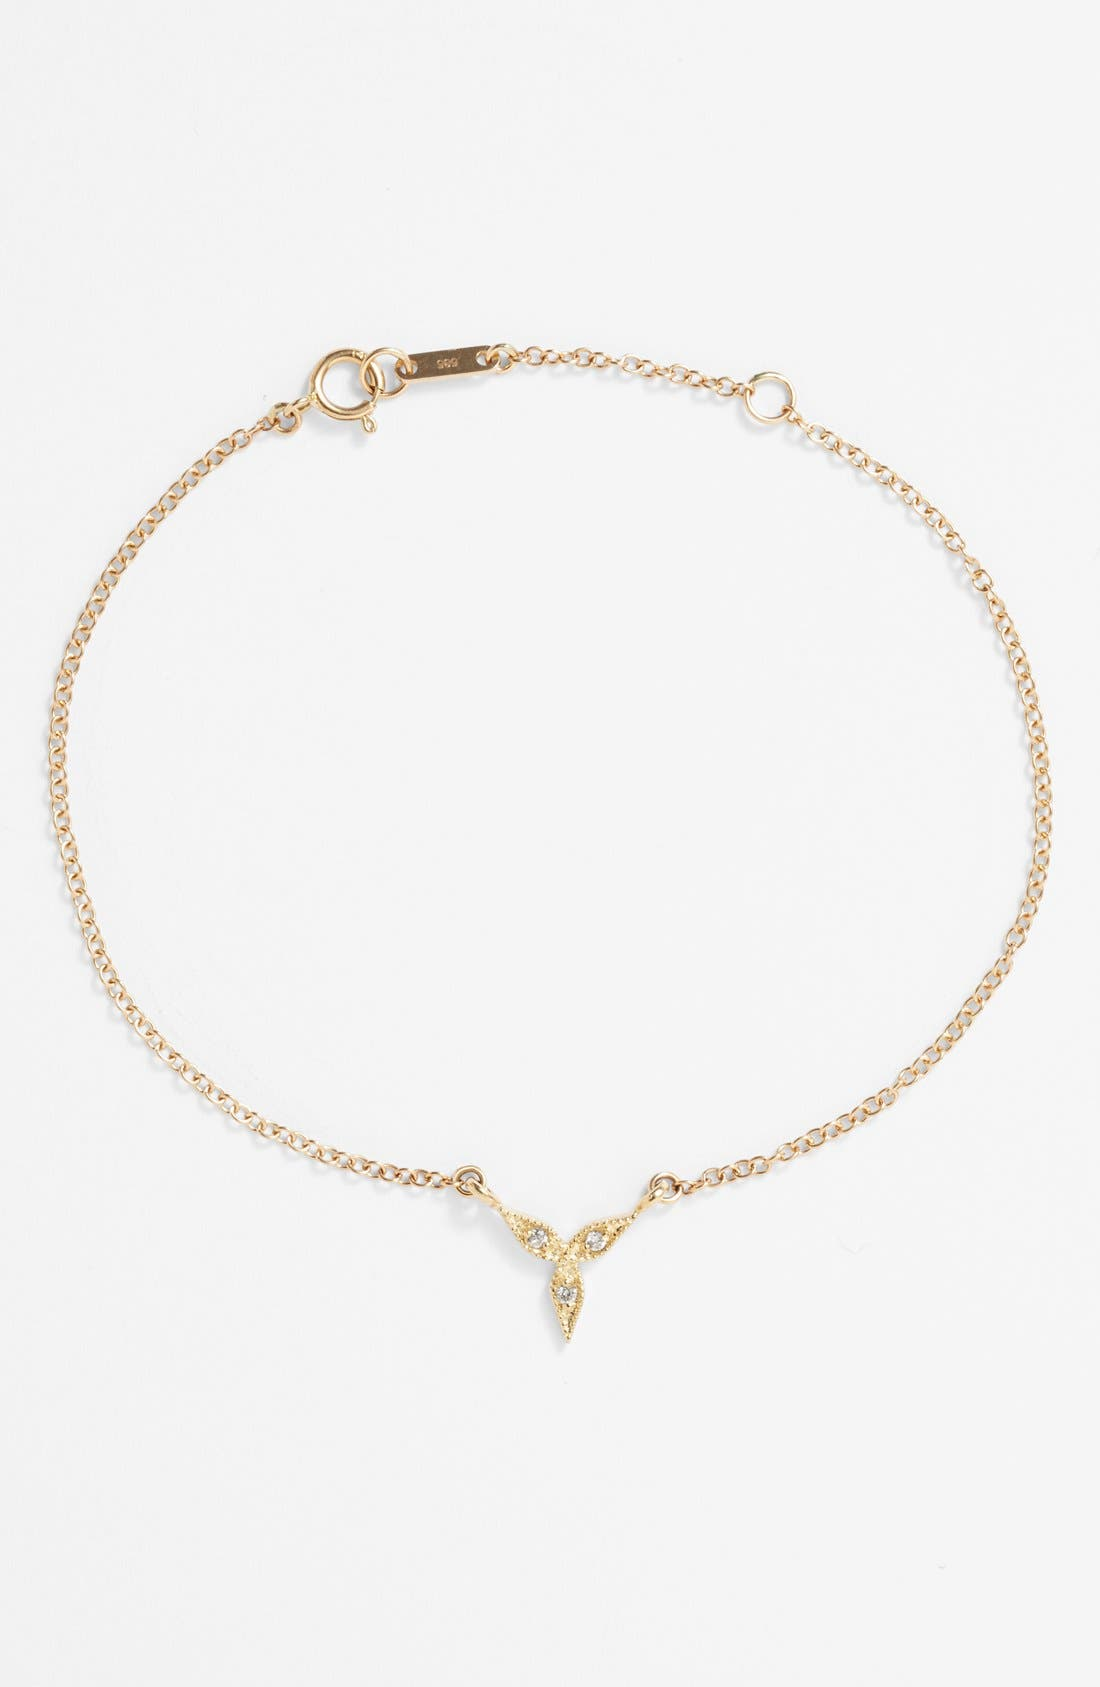 Main Image - Mizuki 'Sea of Beauty' Diamond Station Bracelet